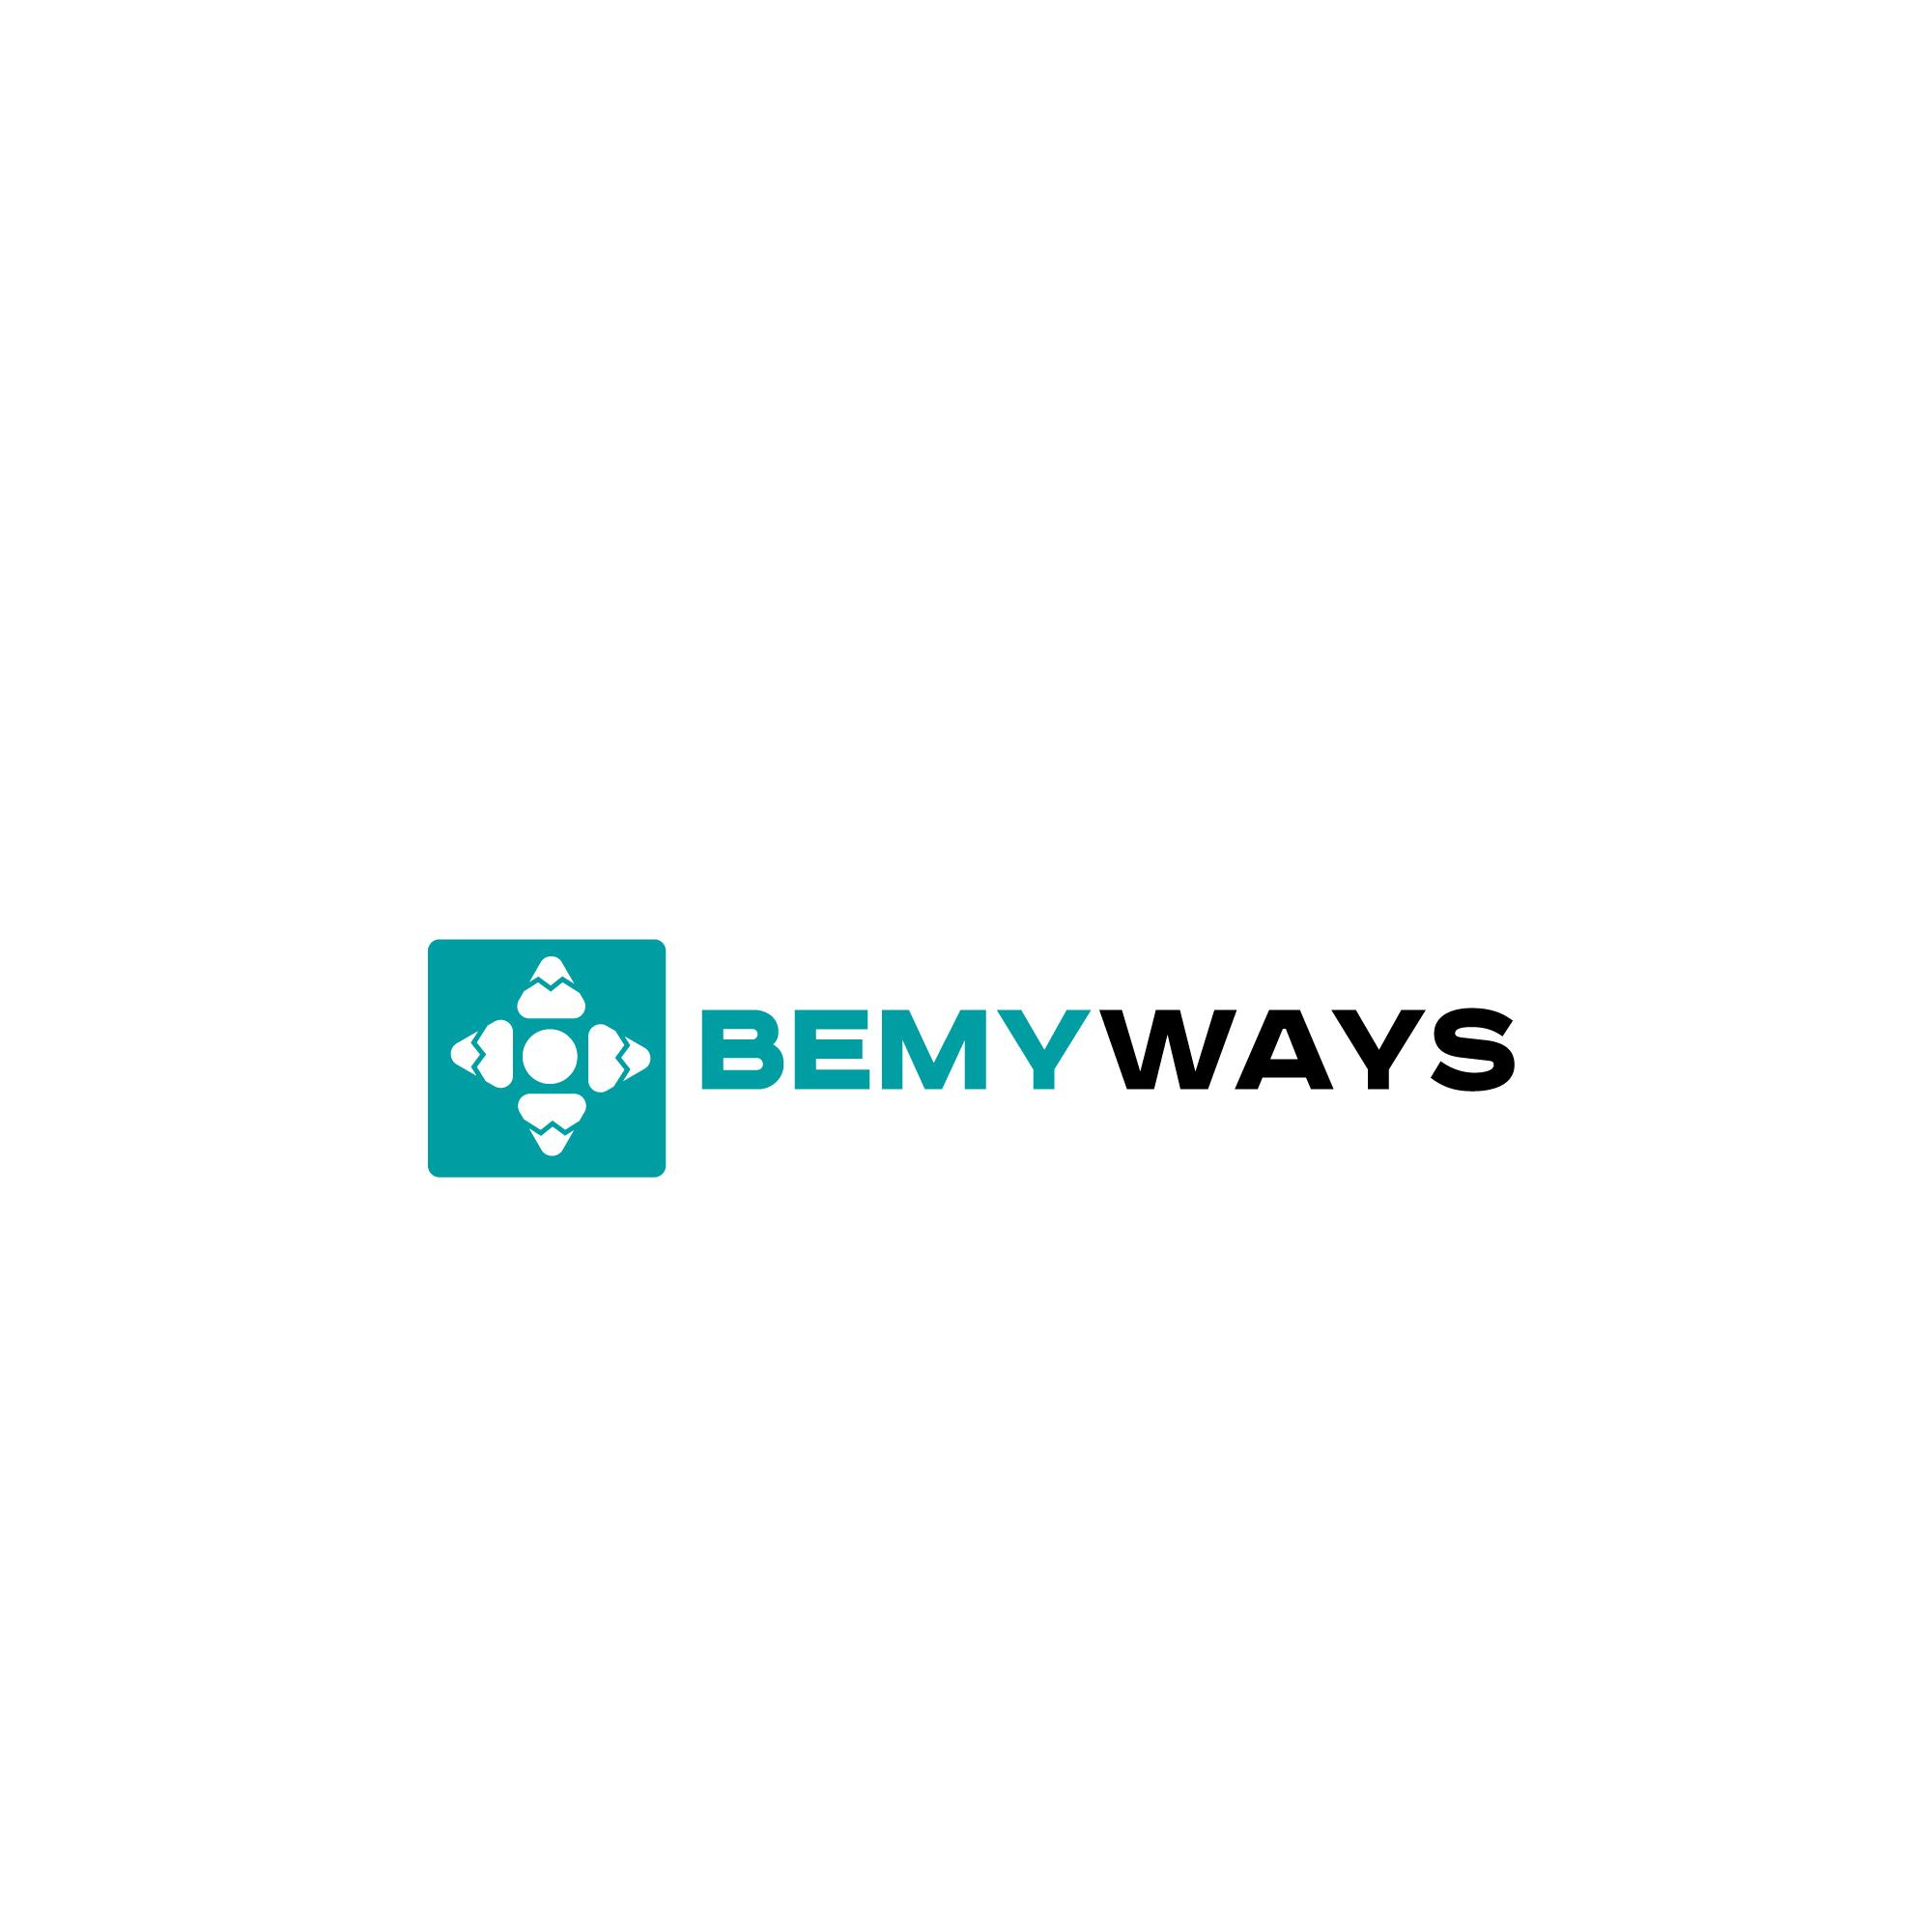 Разработка логотипа и иконки для Travel Video Platform фото f_9155c377300881f9.jpg